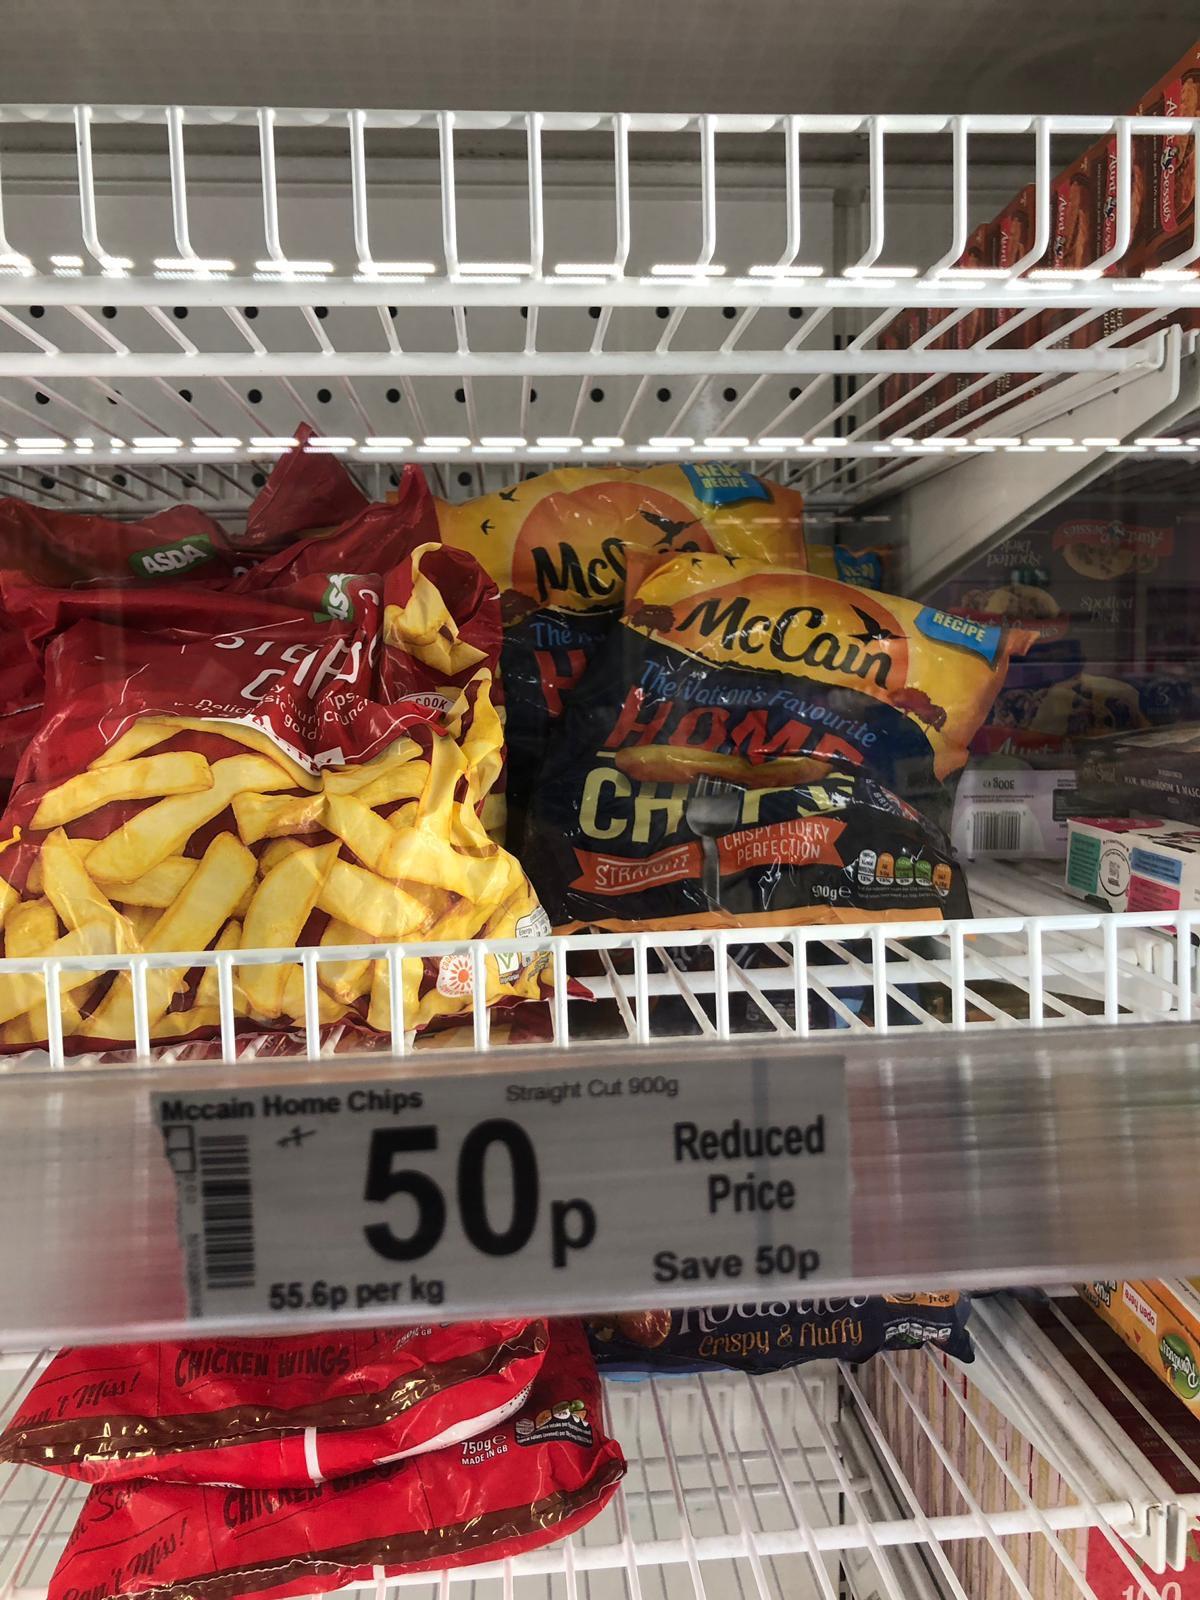 McCain Straight Cut Chips 900g 50p in store @ Asda